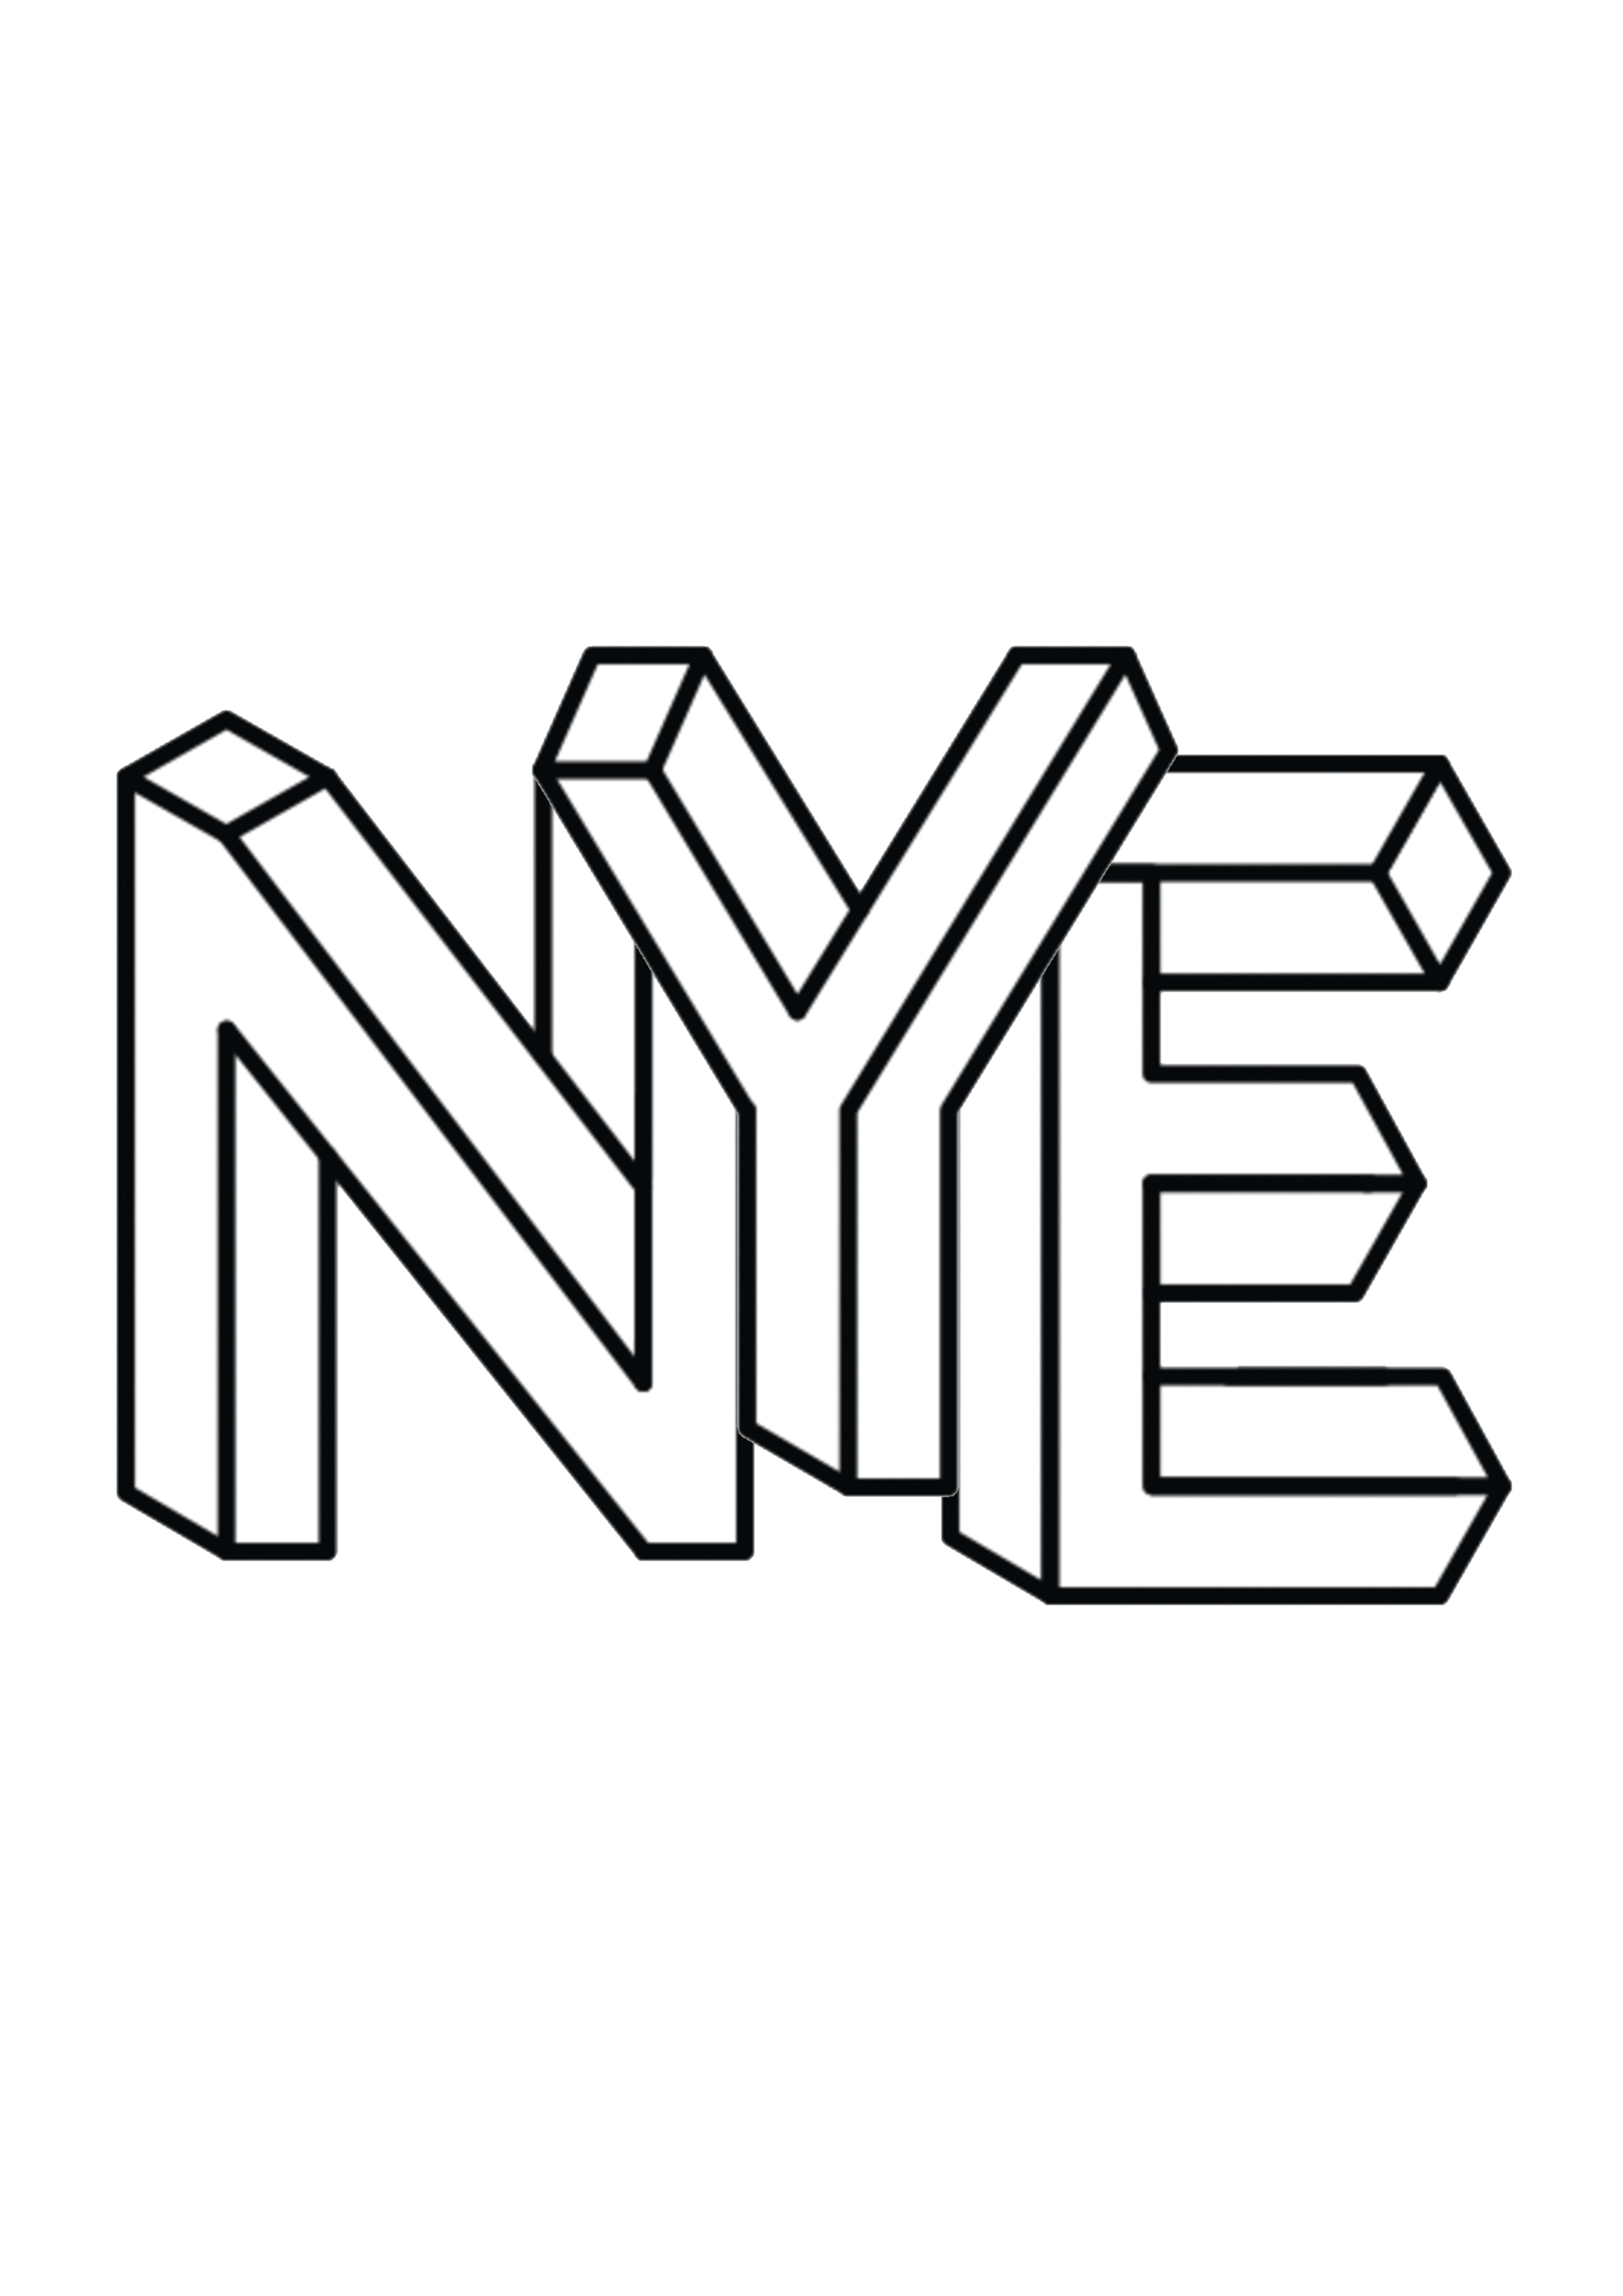 NYE logo